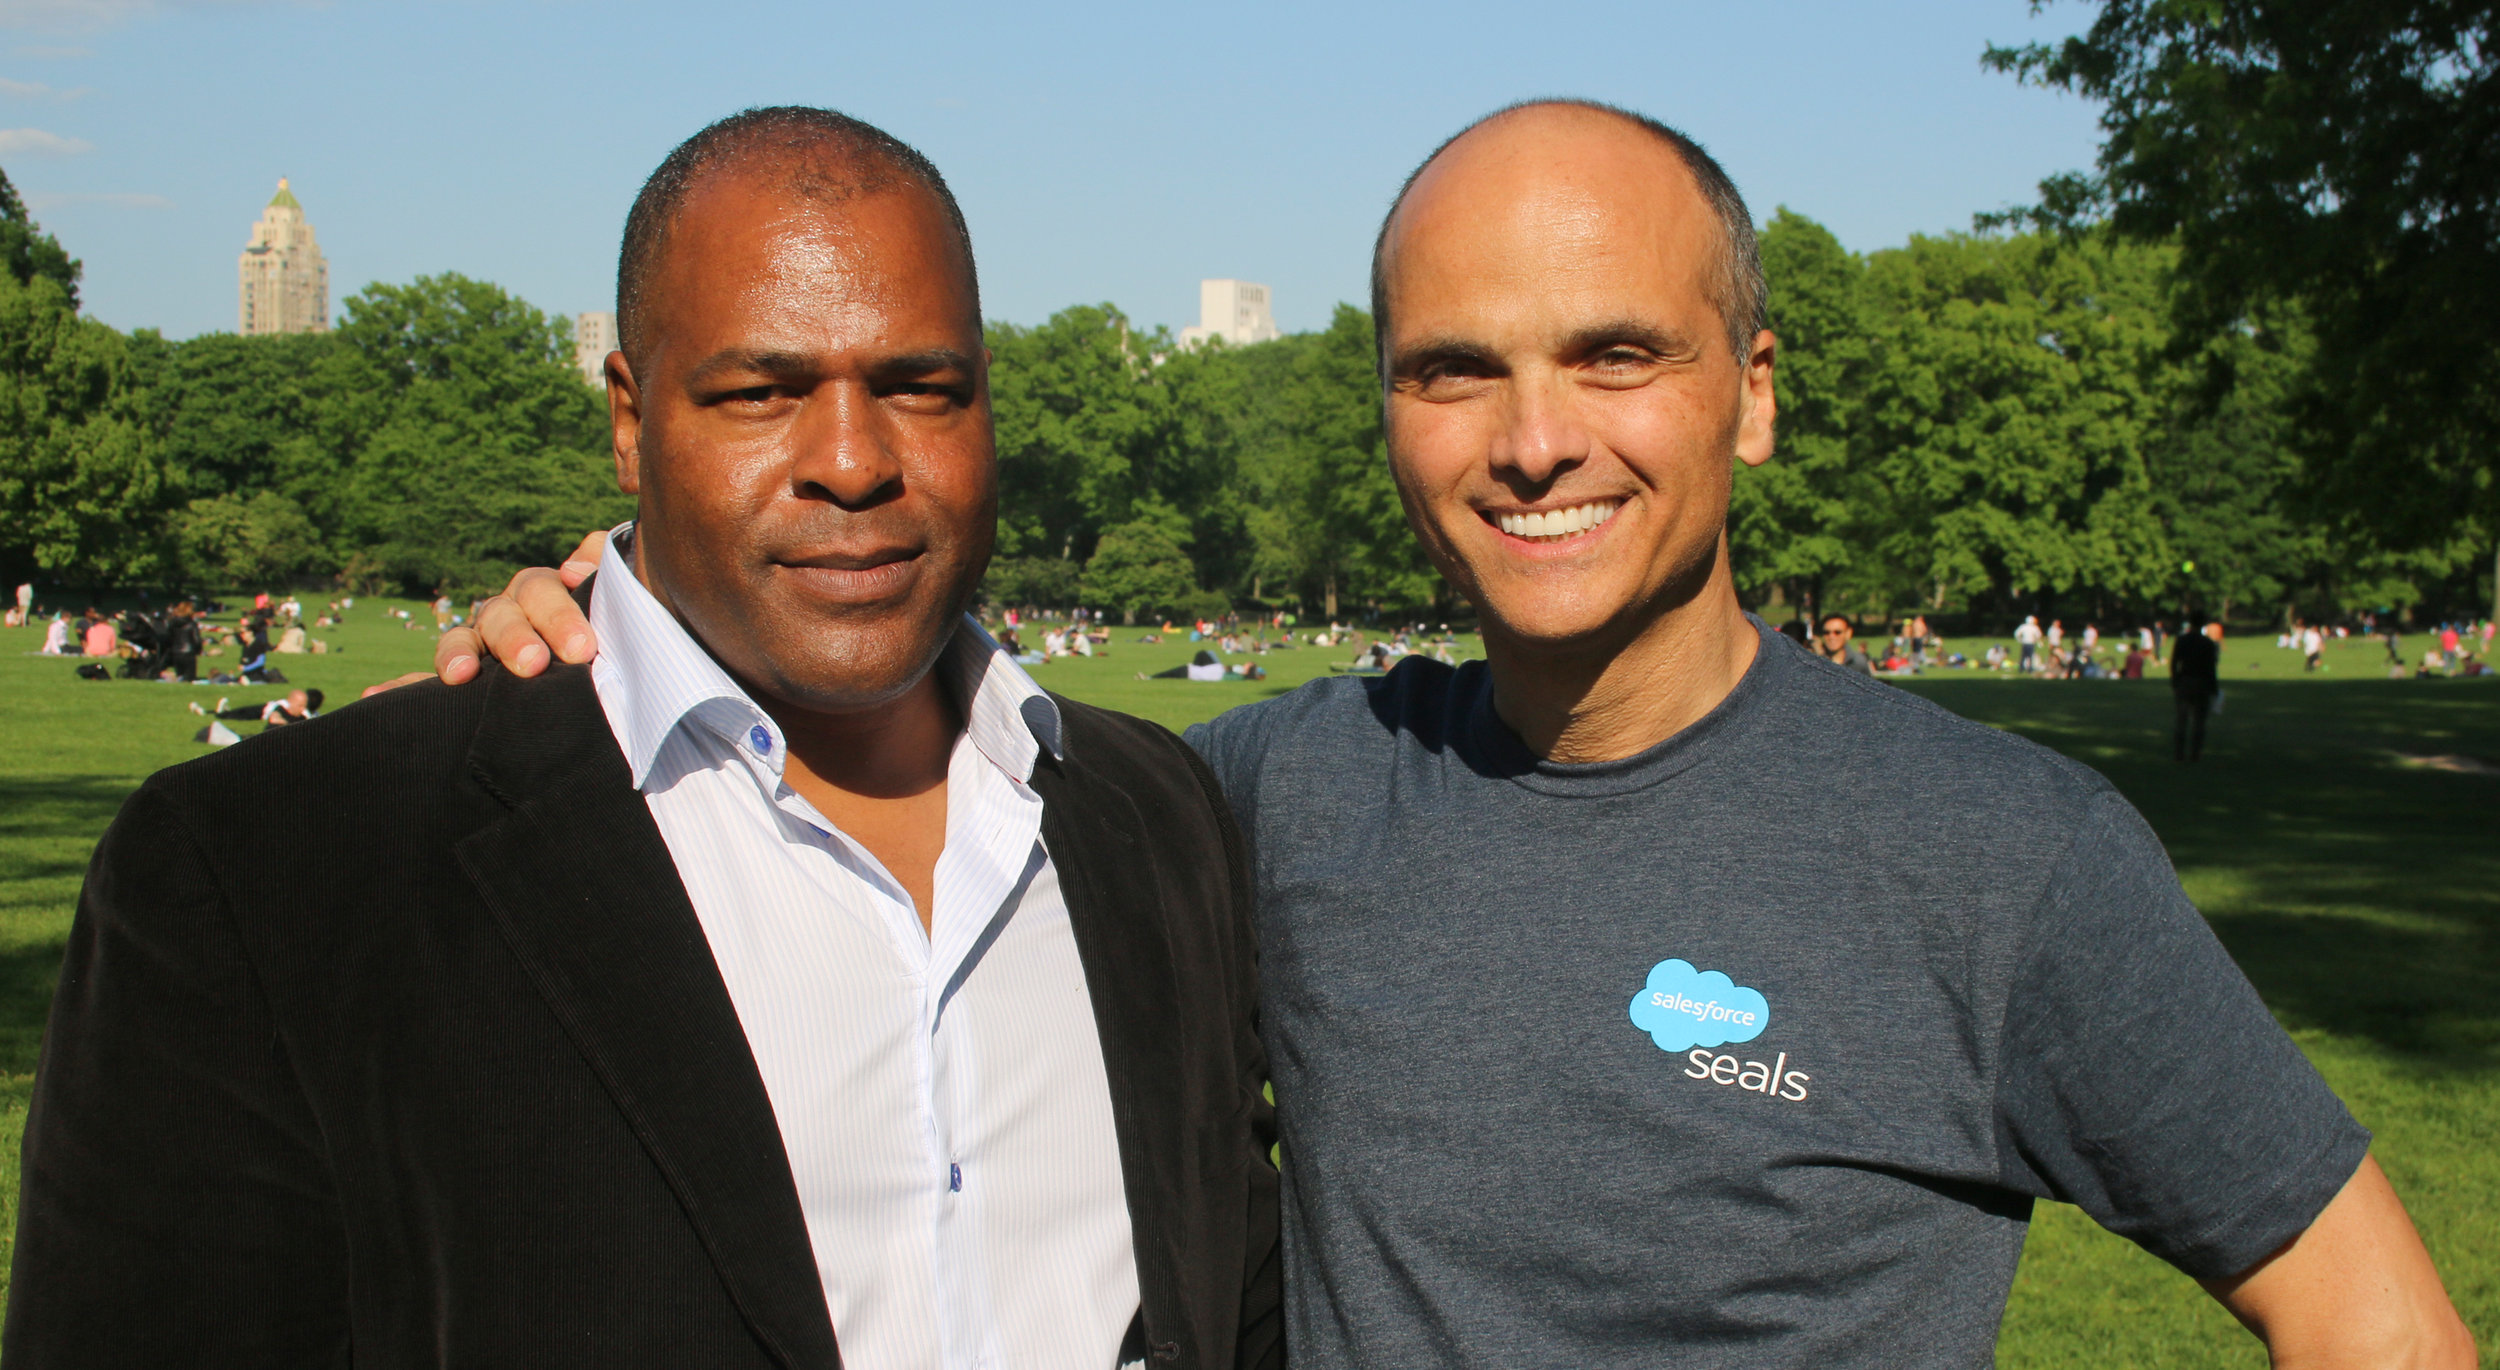 Former U.S. Navy SEAL & Orion Advisor Rob Roy with Orion Founder, Yacov Wrocherinsky